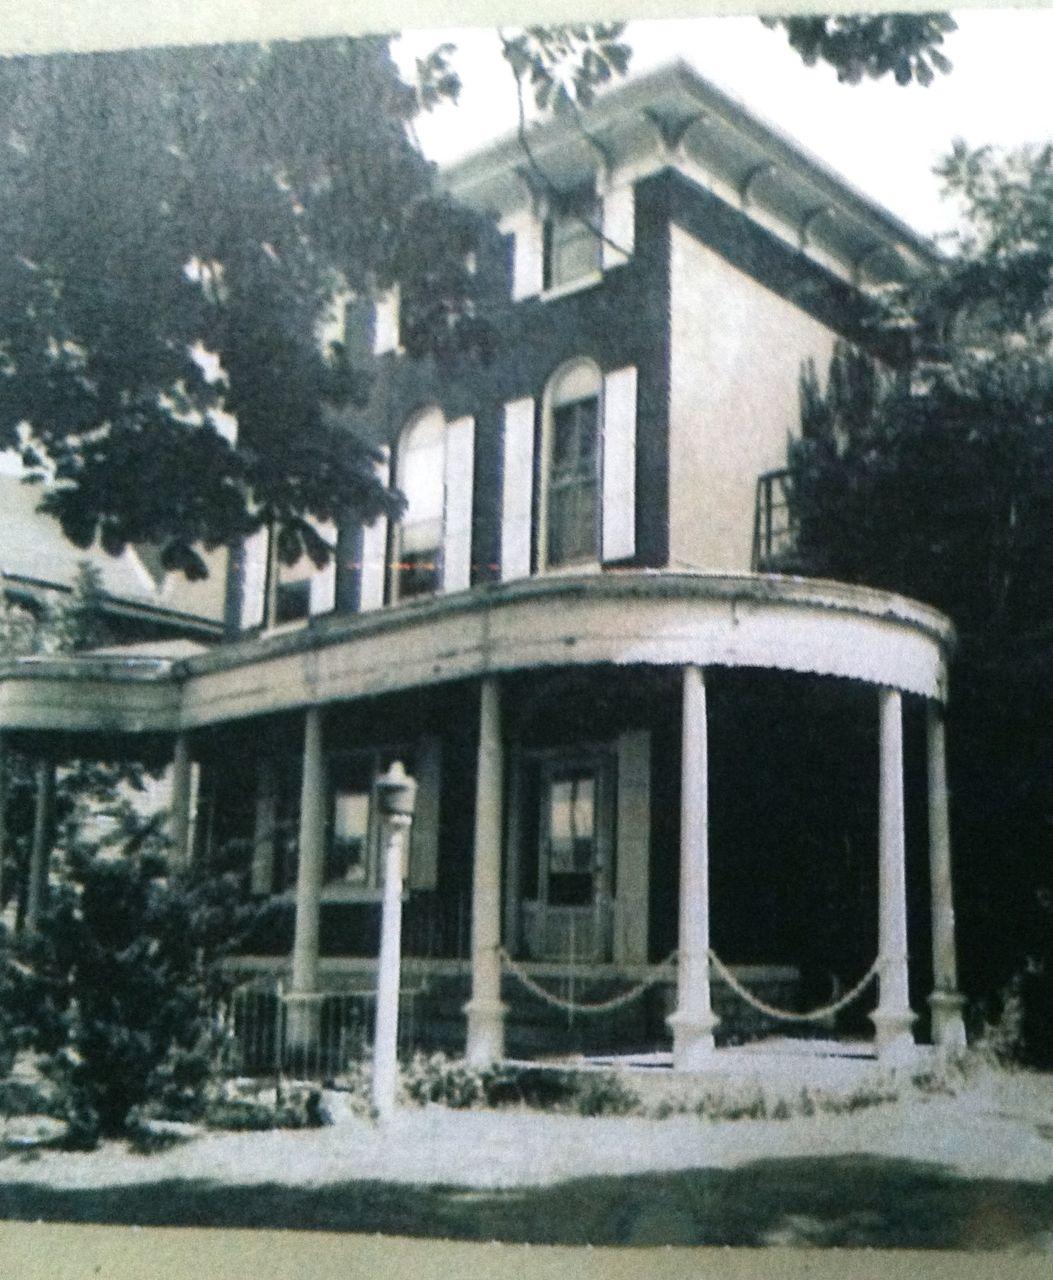 Wilkeson House